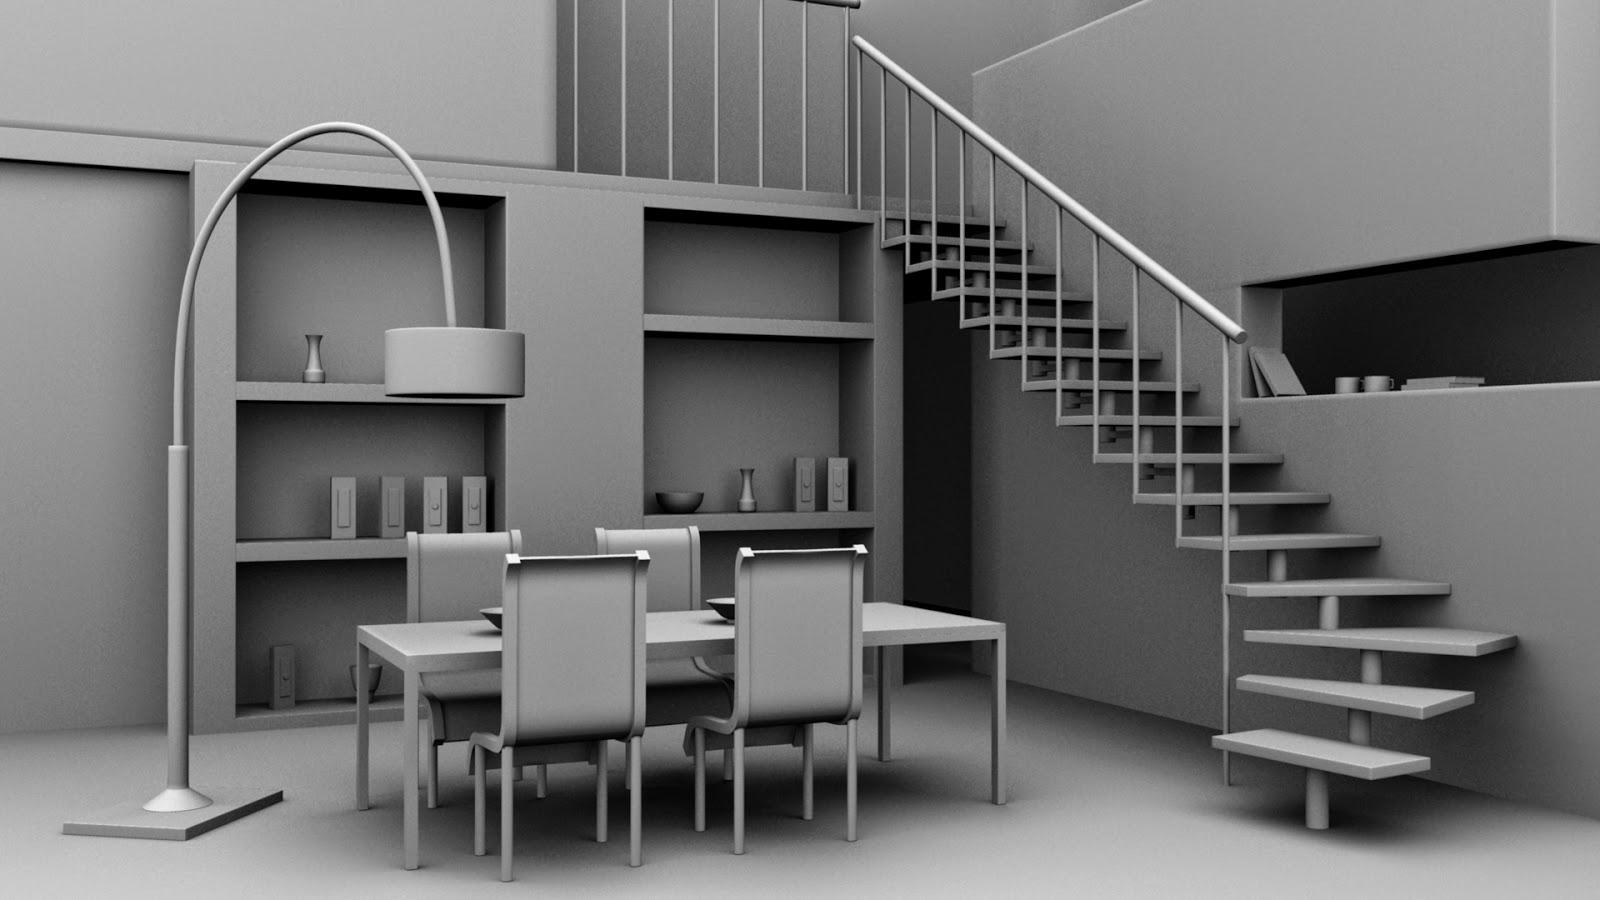 Home Design Interiors Software 3d Models In Autodesk Maya Interior Dining Area